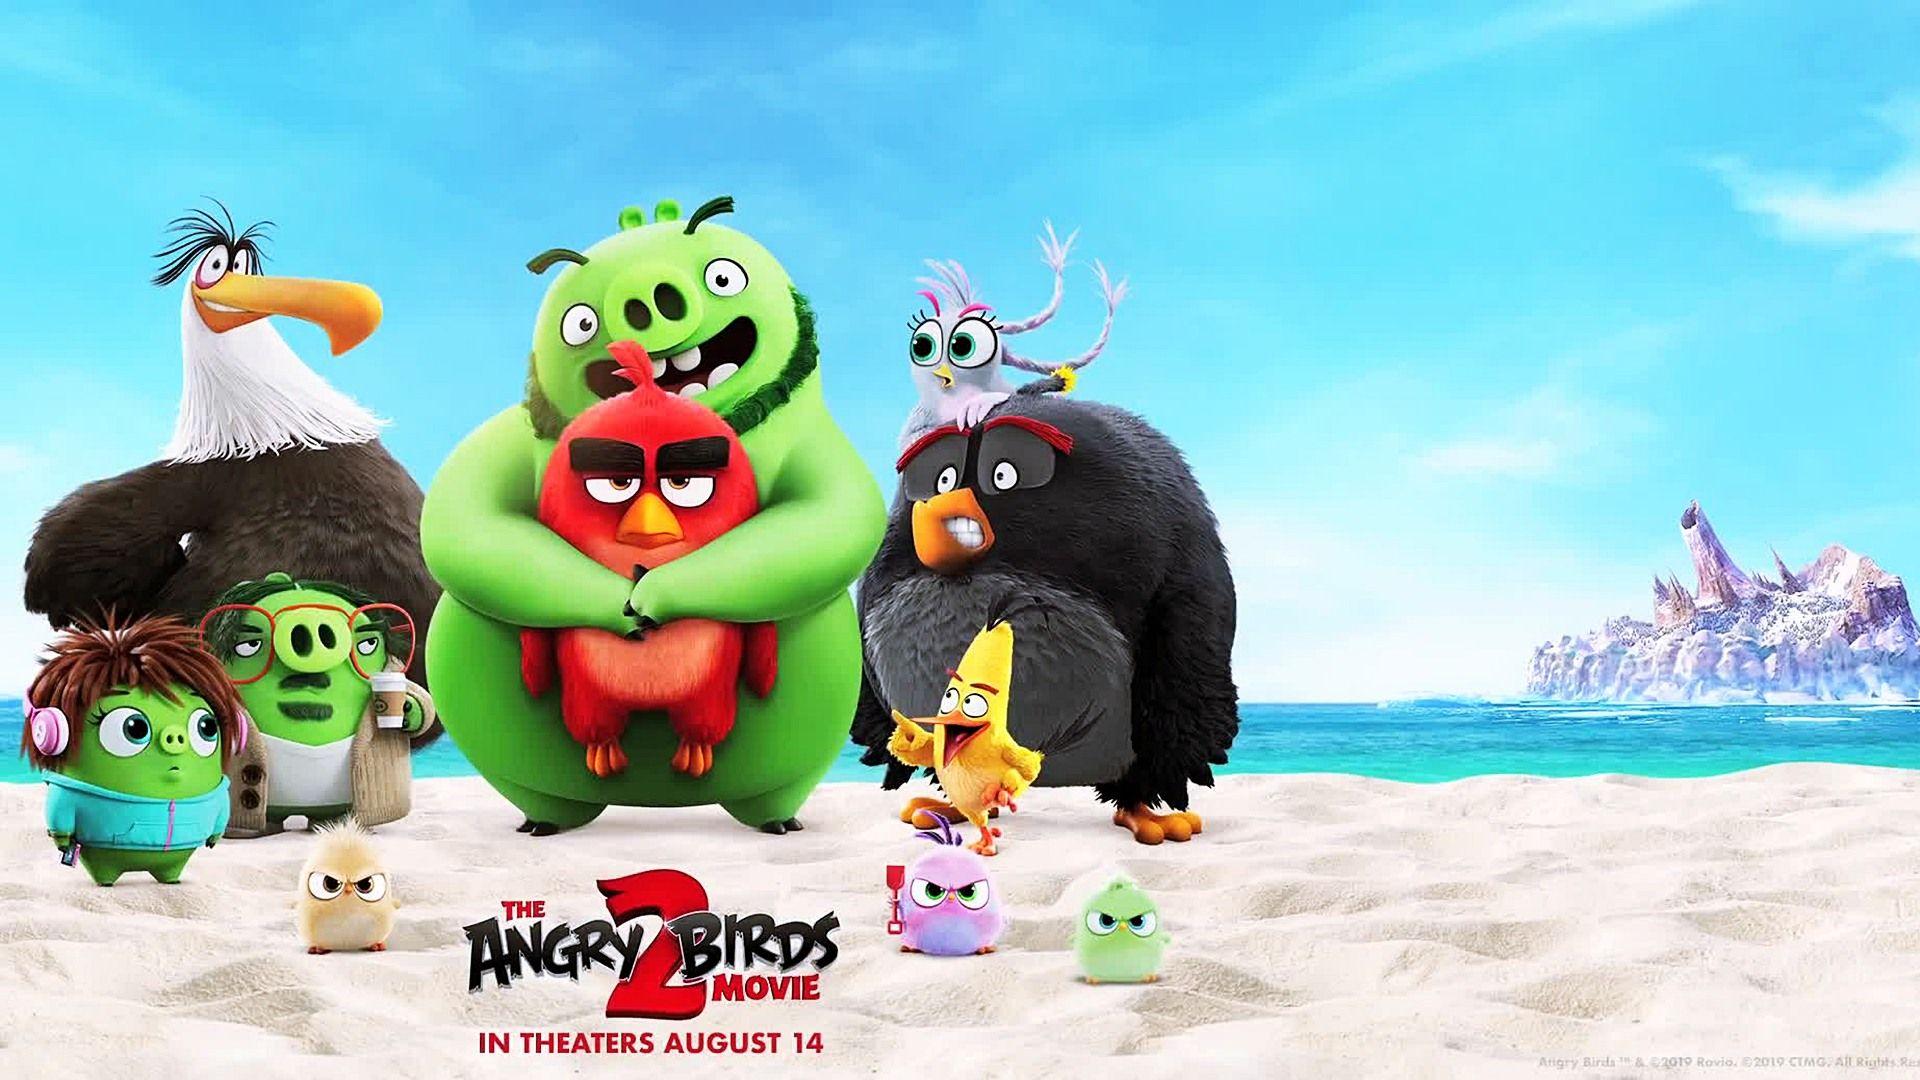 The Angry Birds Movie 2 (2019) น้องนกกับหมูเขียวร่วมมือ